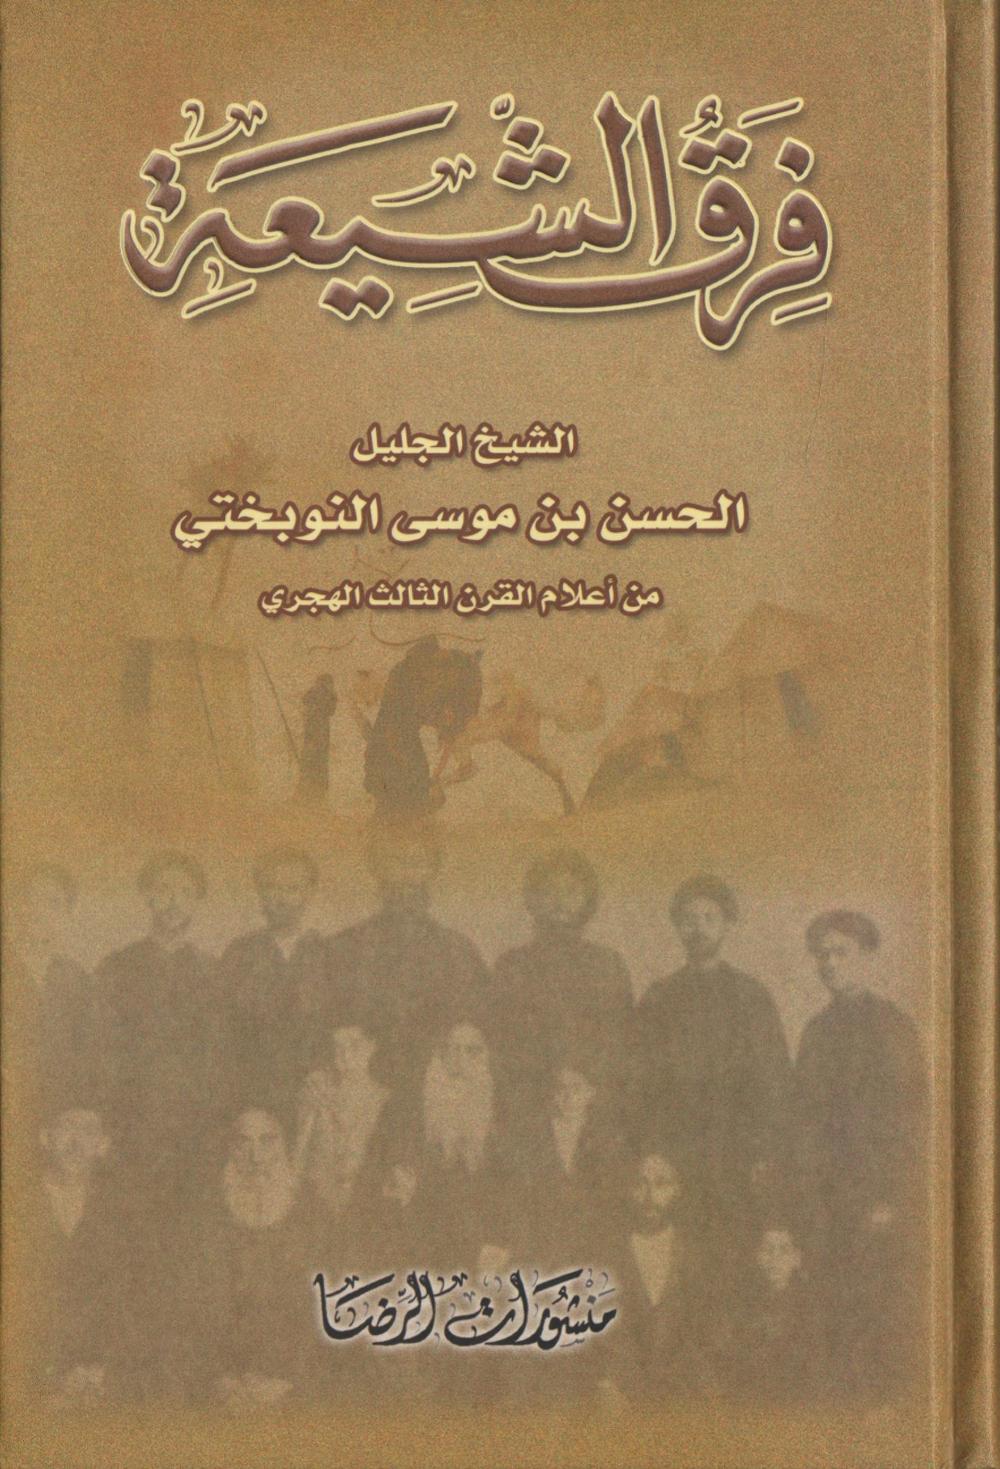 فرق الشيعة النوبختي Free Download Borrow And Streaming Internet Archive In 2020 Book Club Books Arabic Books Books